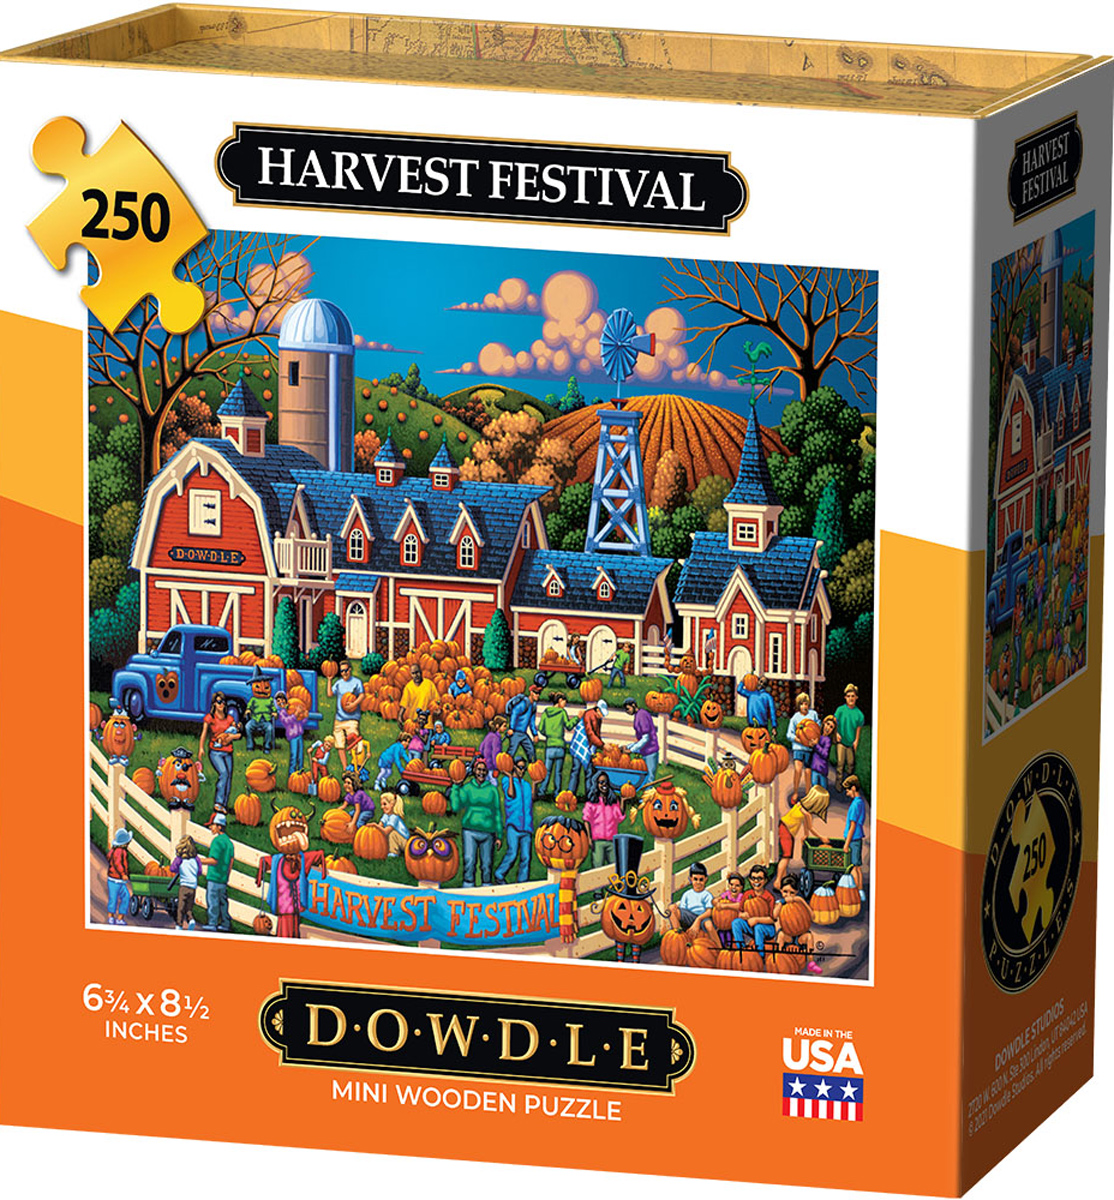 Harvest Festival Halloween Jigsaw Puzzle